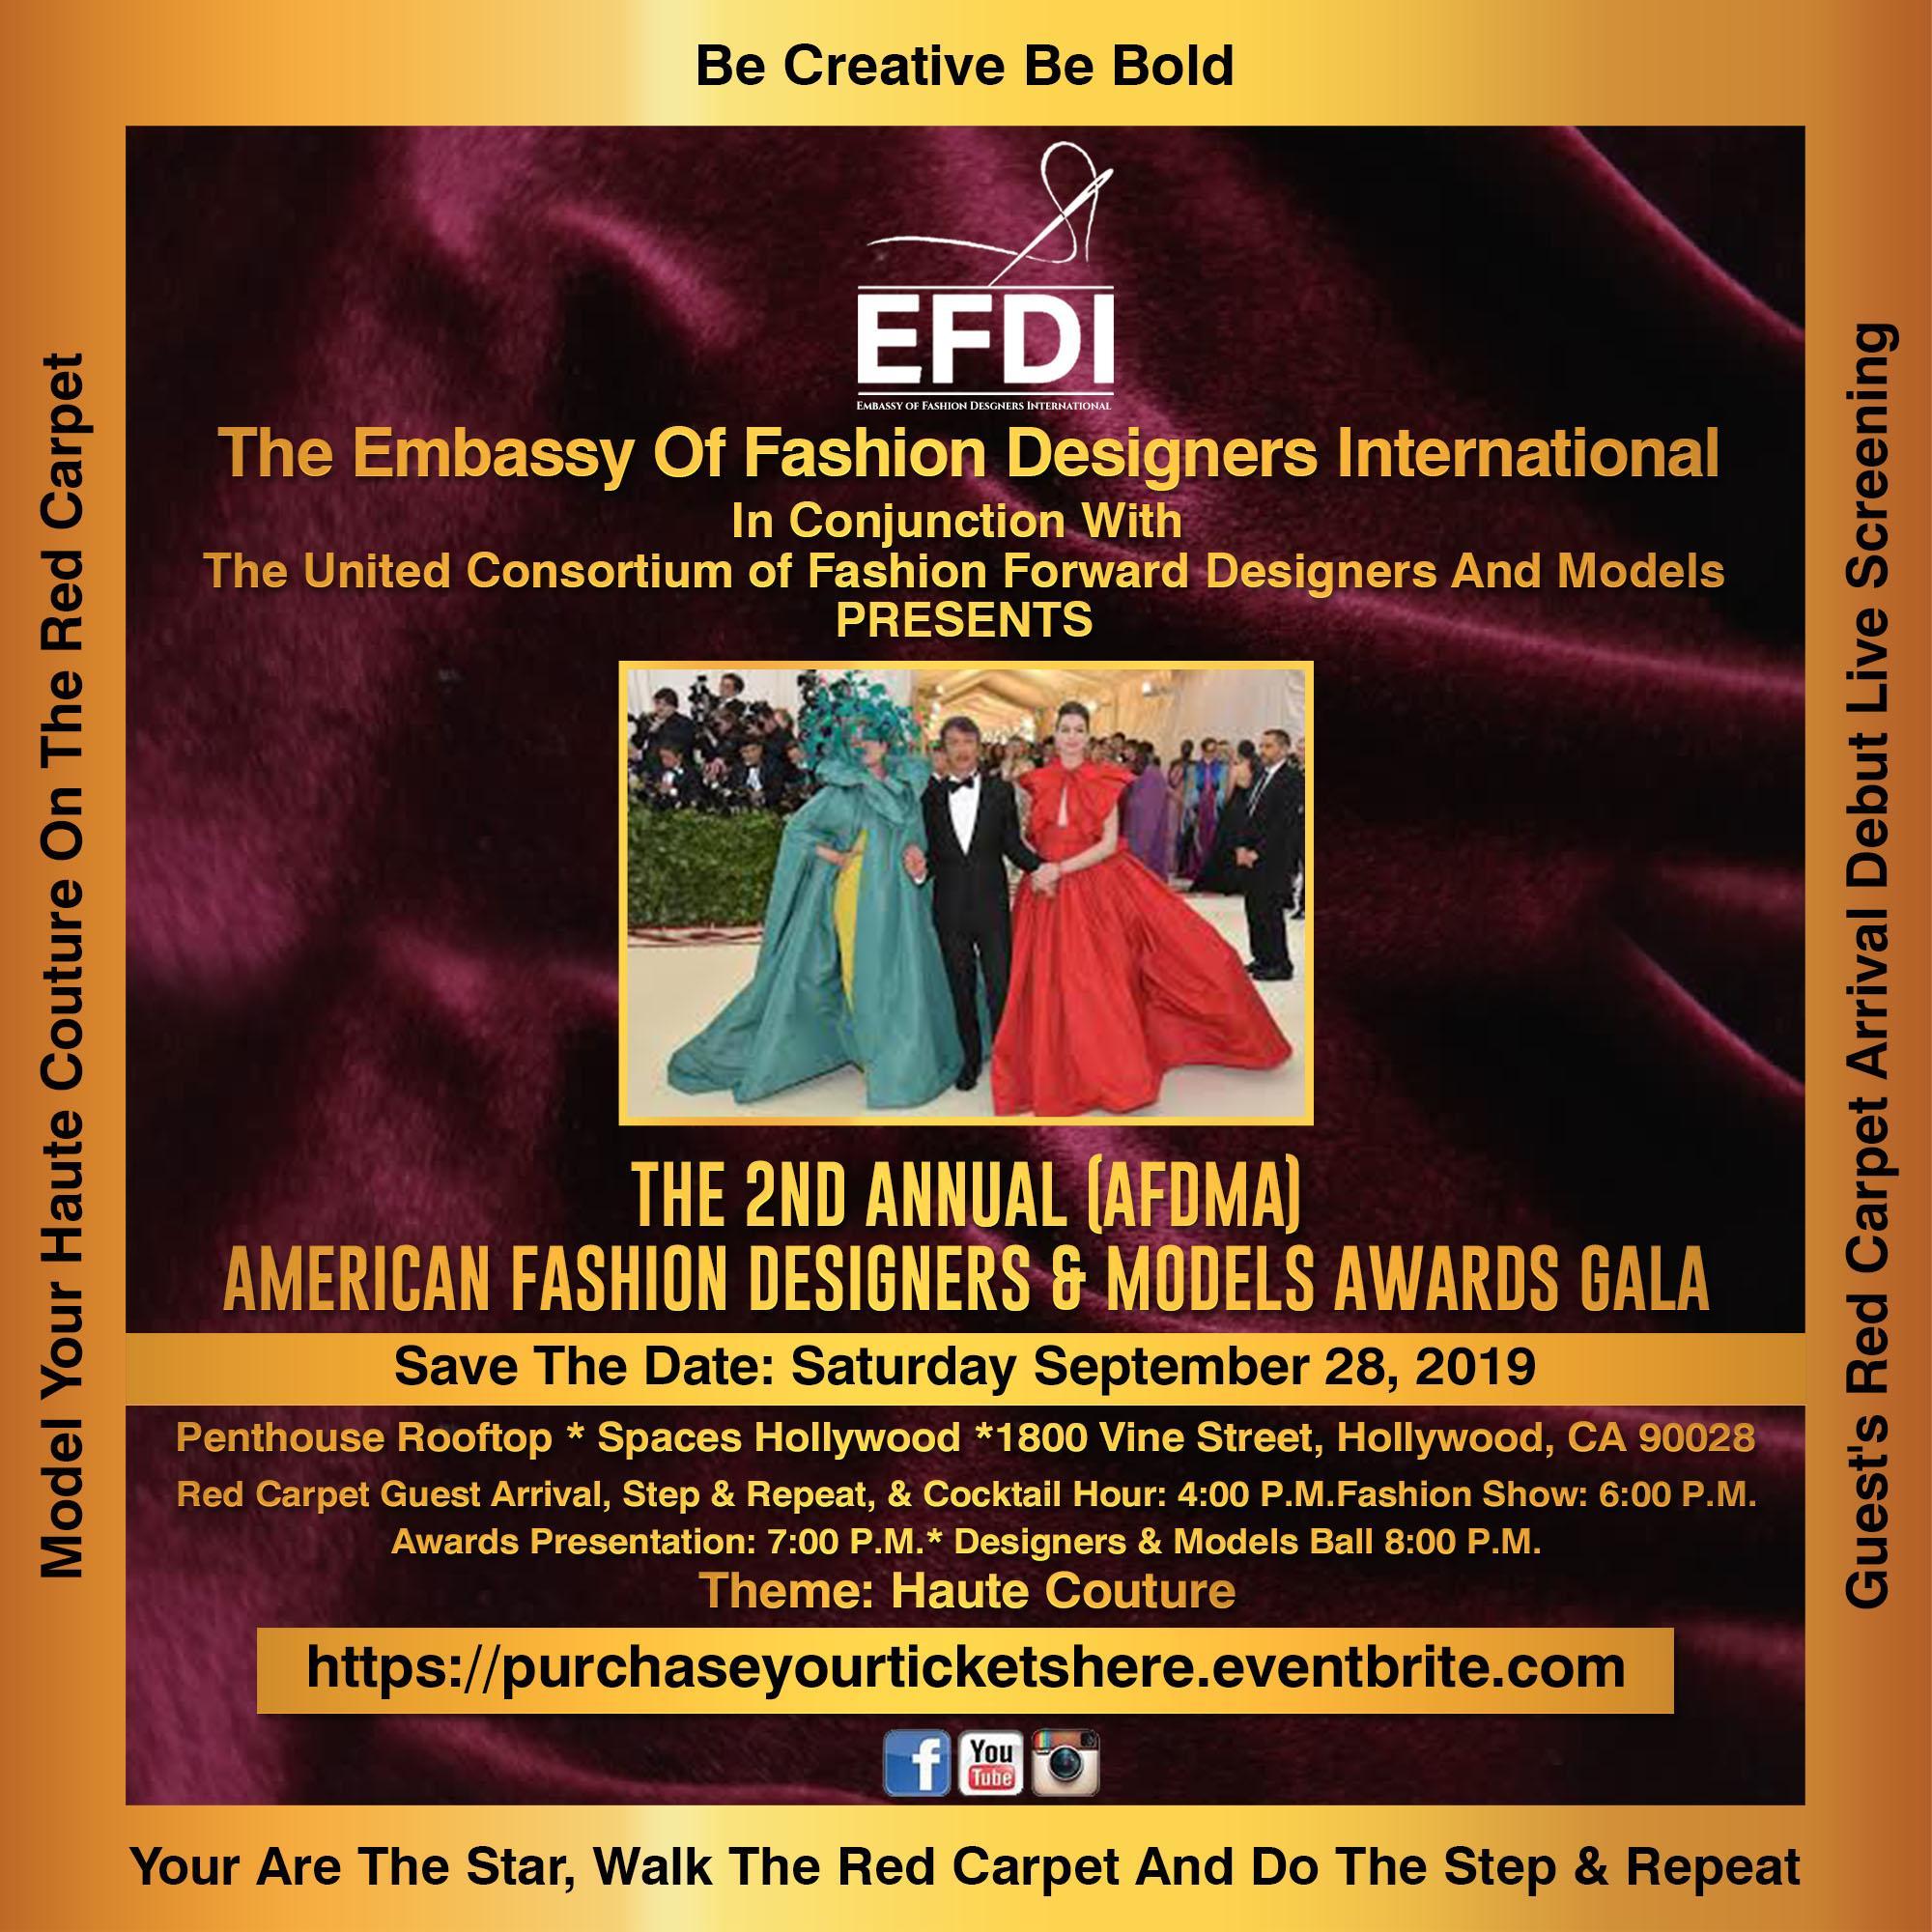 Embassy Of Fashion Designers International Tickets